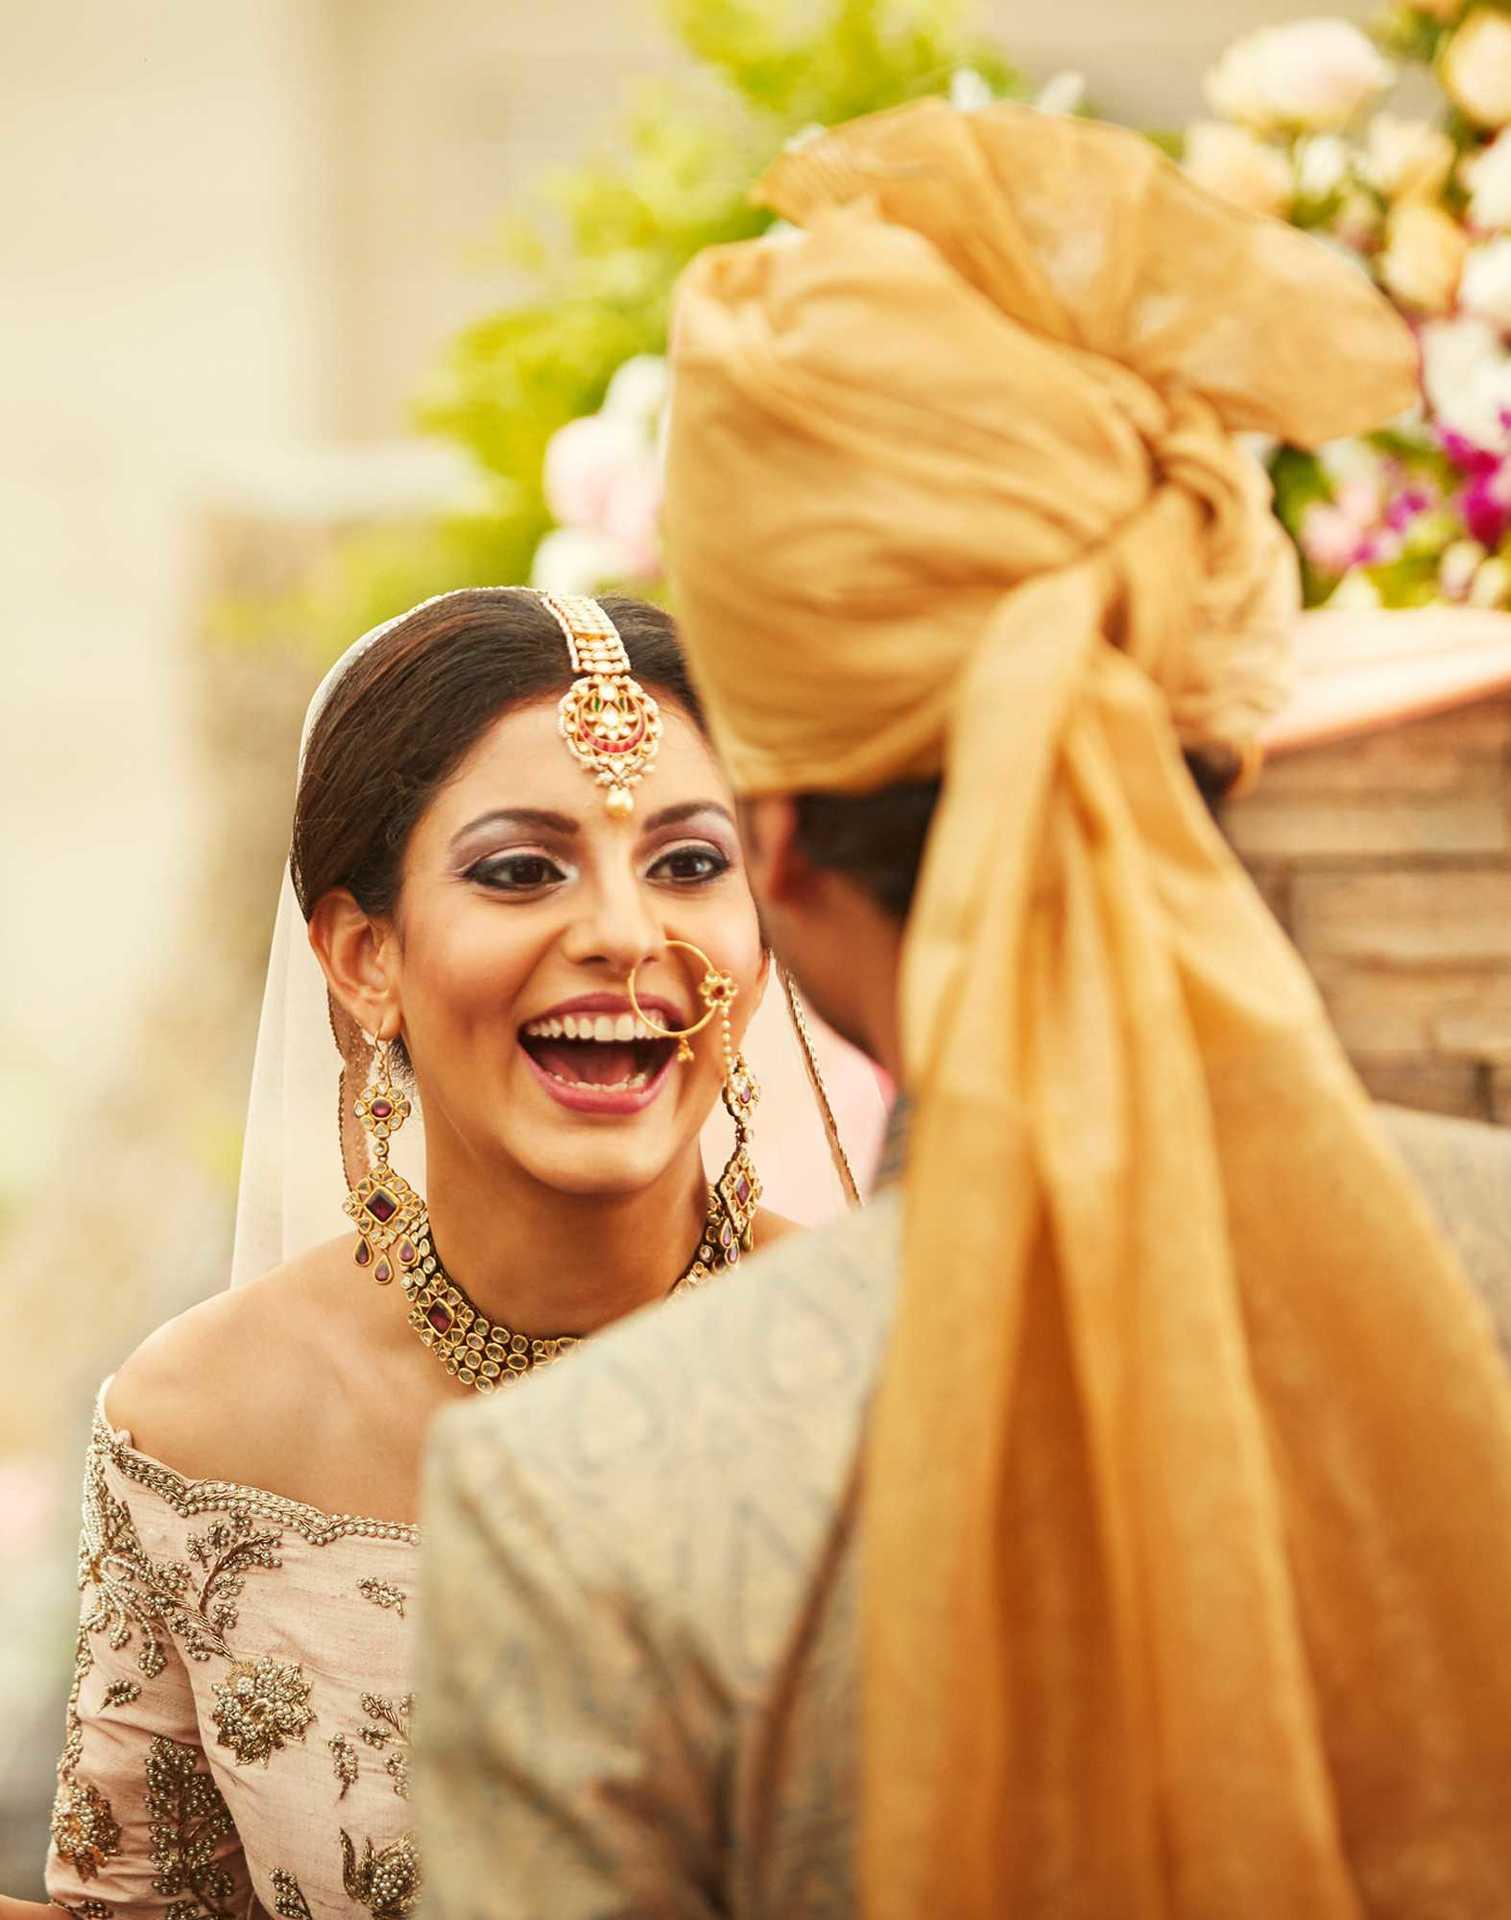 The Art of Wedding at Radisson Blu, Paschim Vihar image